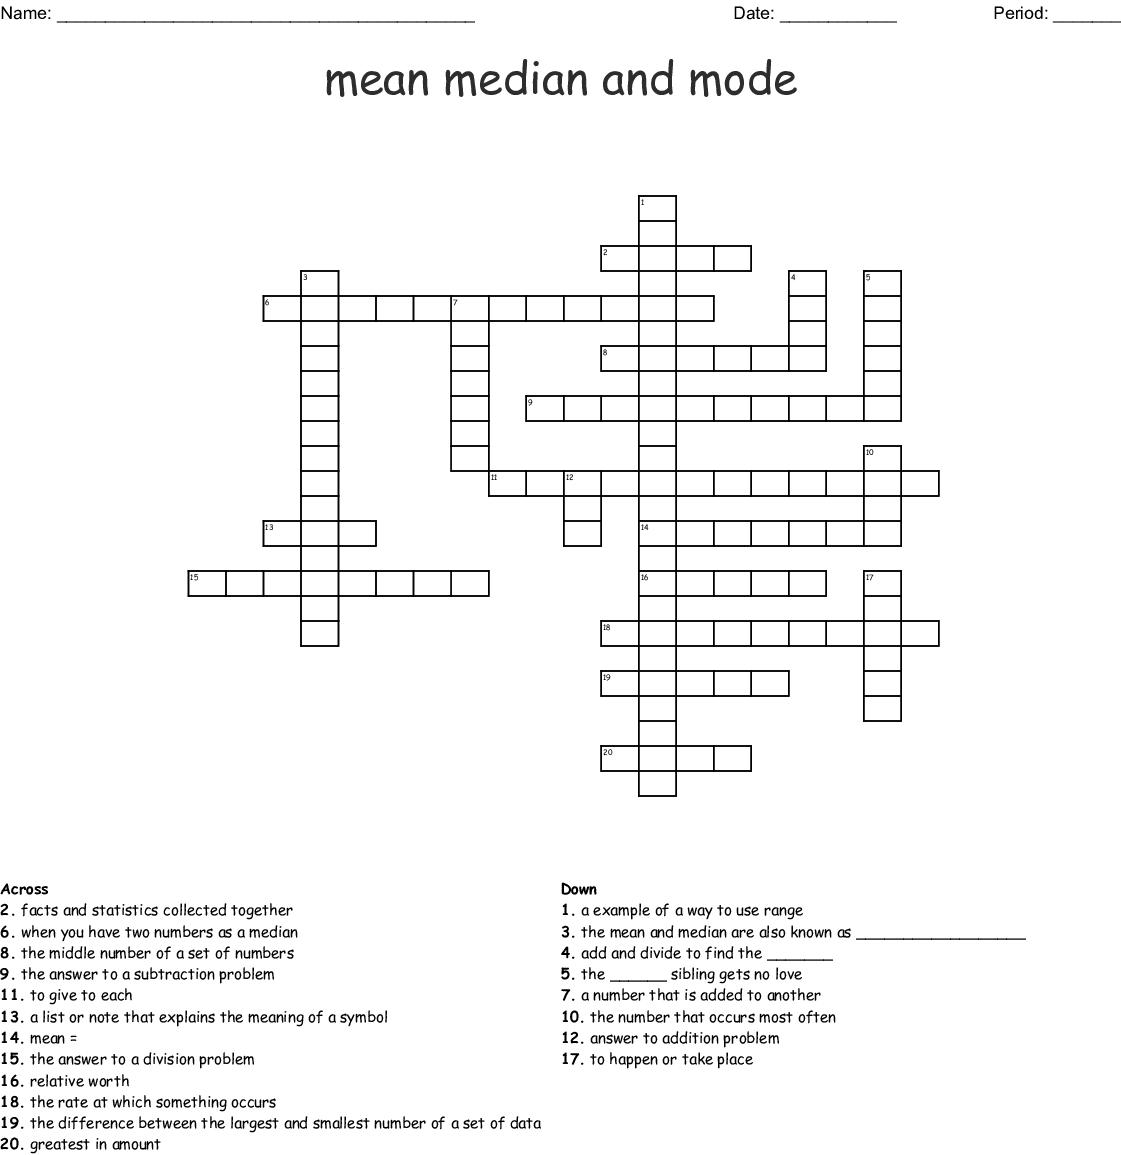 Mean Median Mode And Range Crossword Wordmint